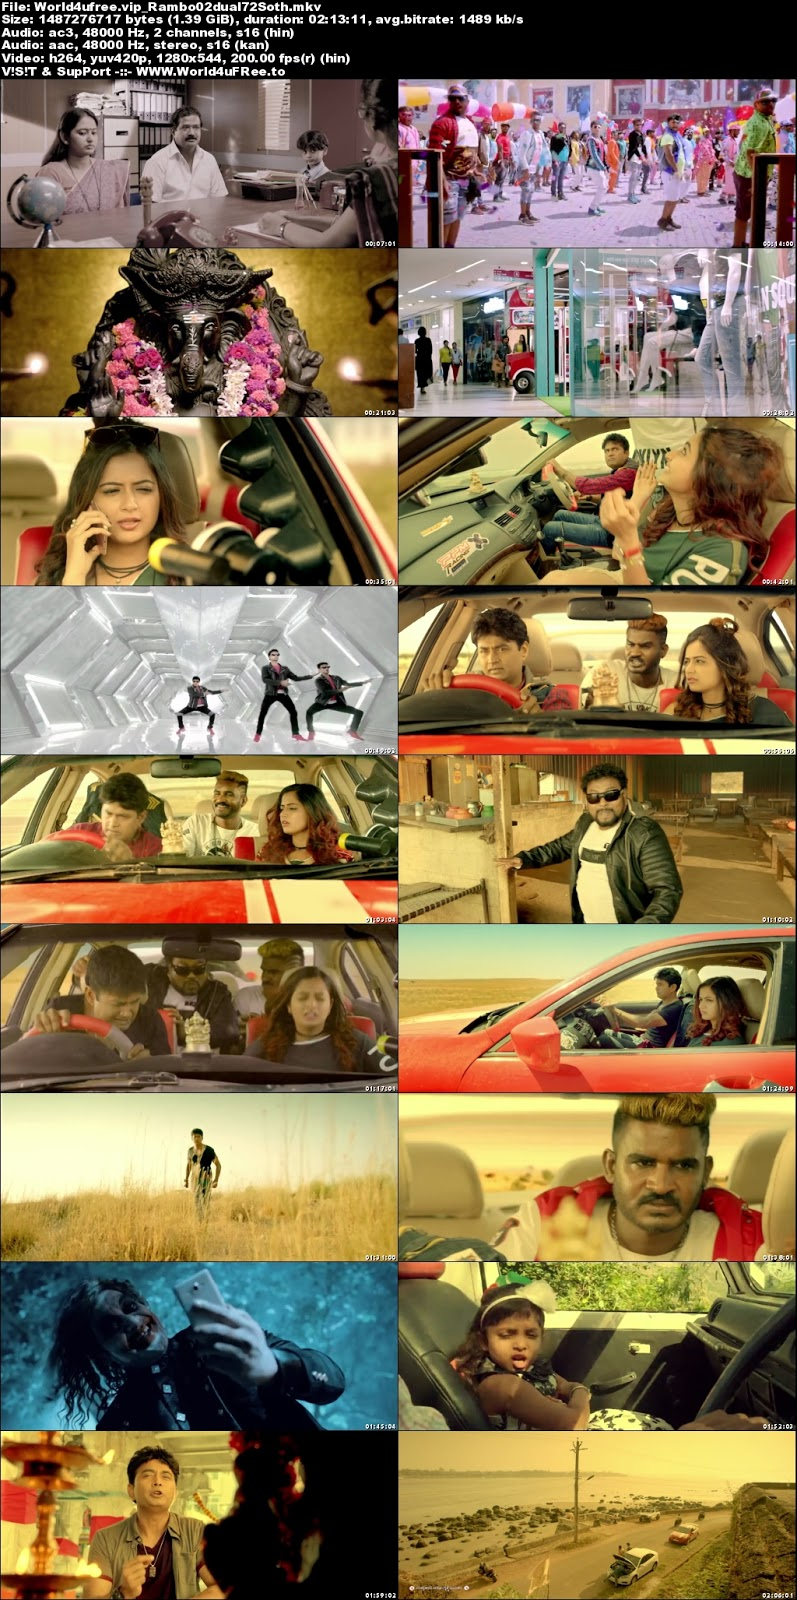 Raambo 2 2018 Dual Audio 720p UNCUT HDRip Download x264 world4ufree.vip , South indian movie Raambo 2 2018 hindi dubbed world4ufree.vip 720p hdrip webrip dvdrip 700mb brrip bluray free download or watch online at world4ufree.vip